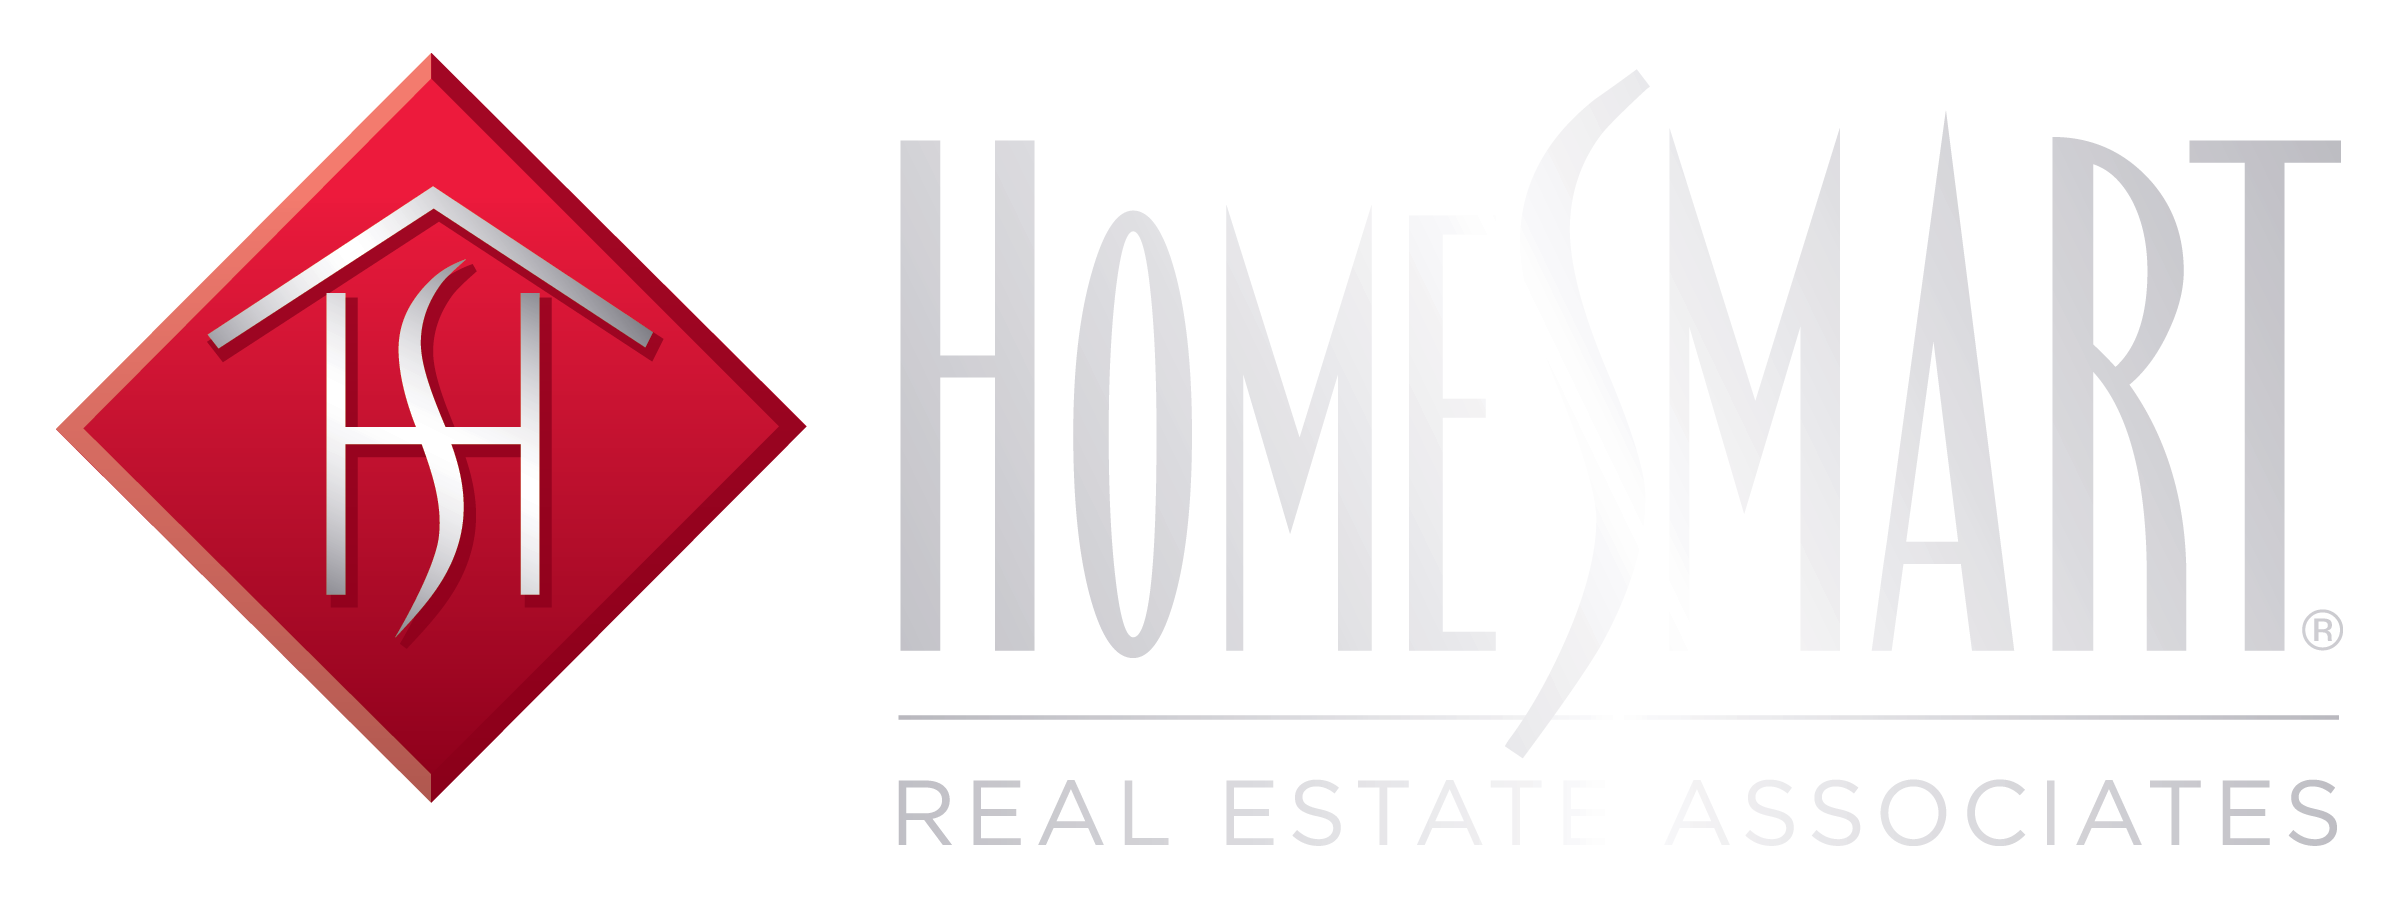 HomeSmart Real Estate Associates logo